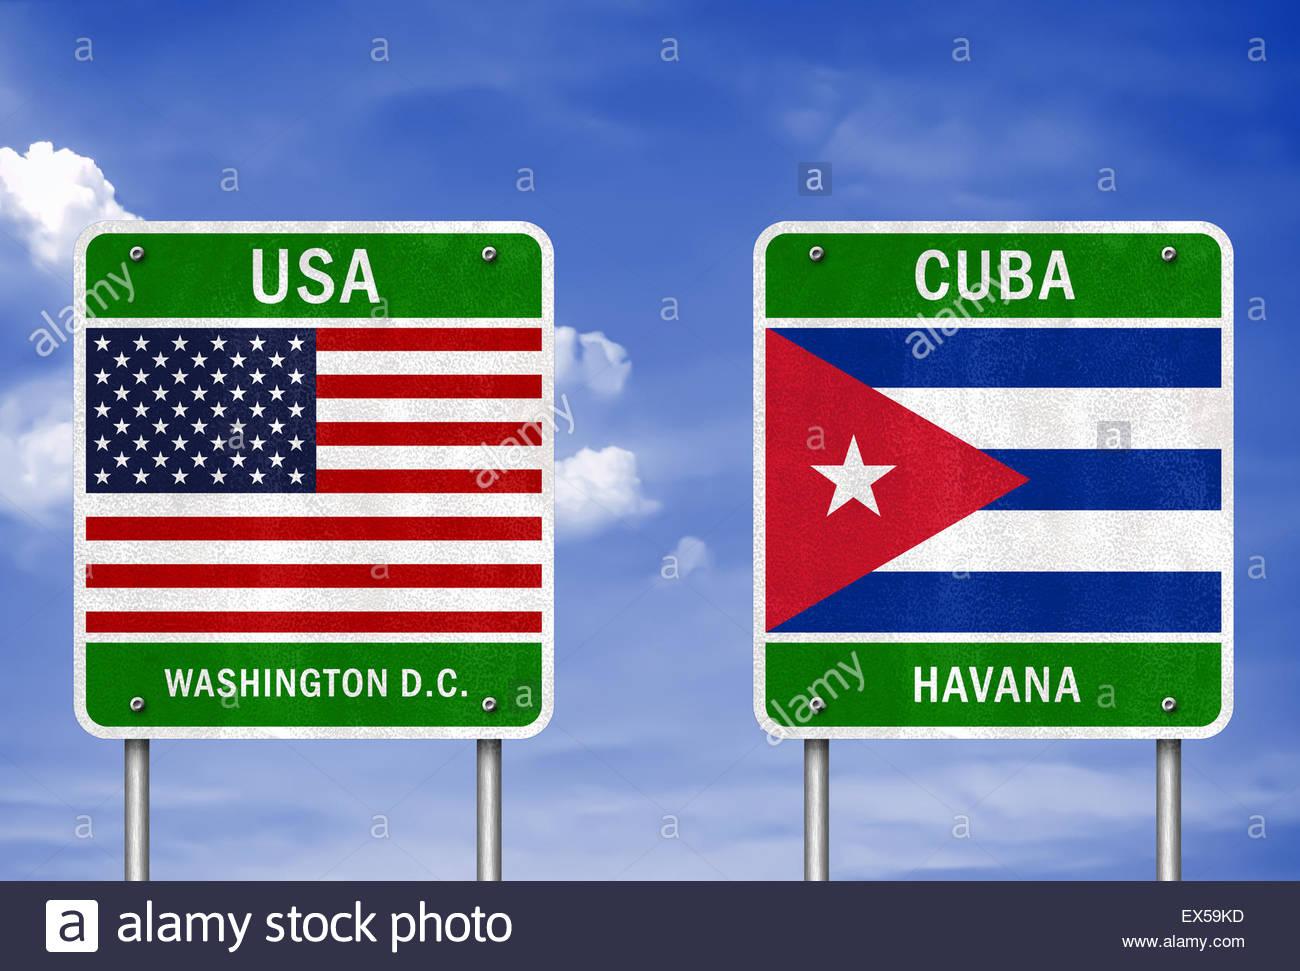 Cuba USA - partnership illustration concept - Stock Image